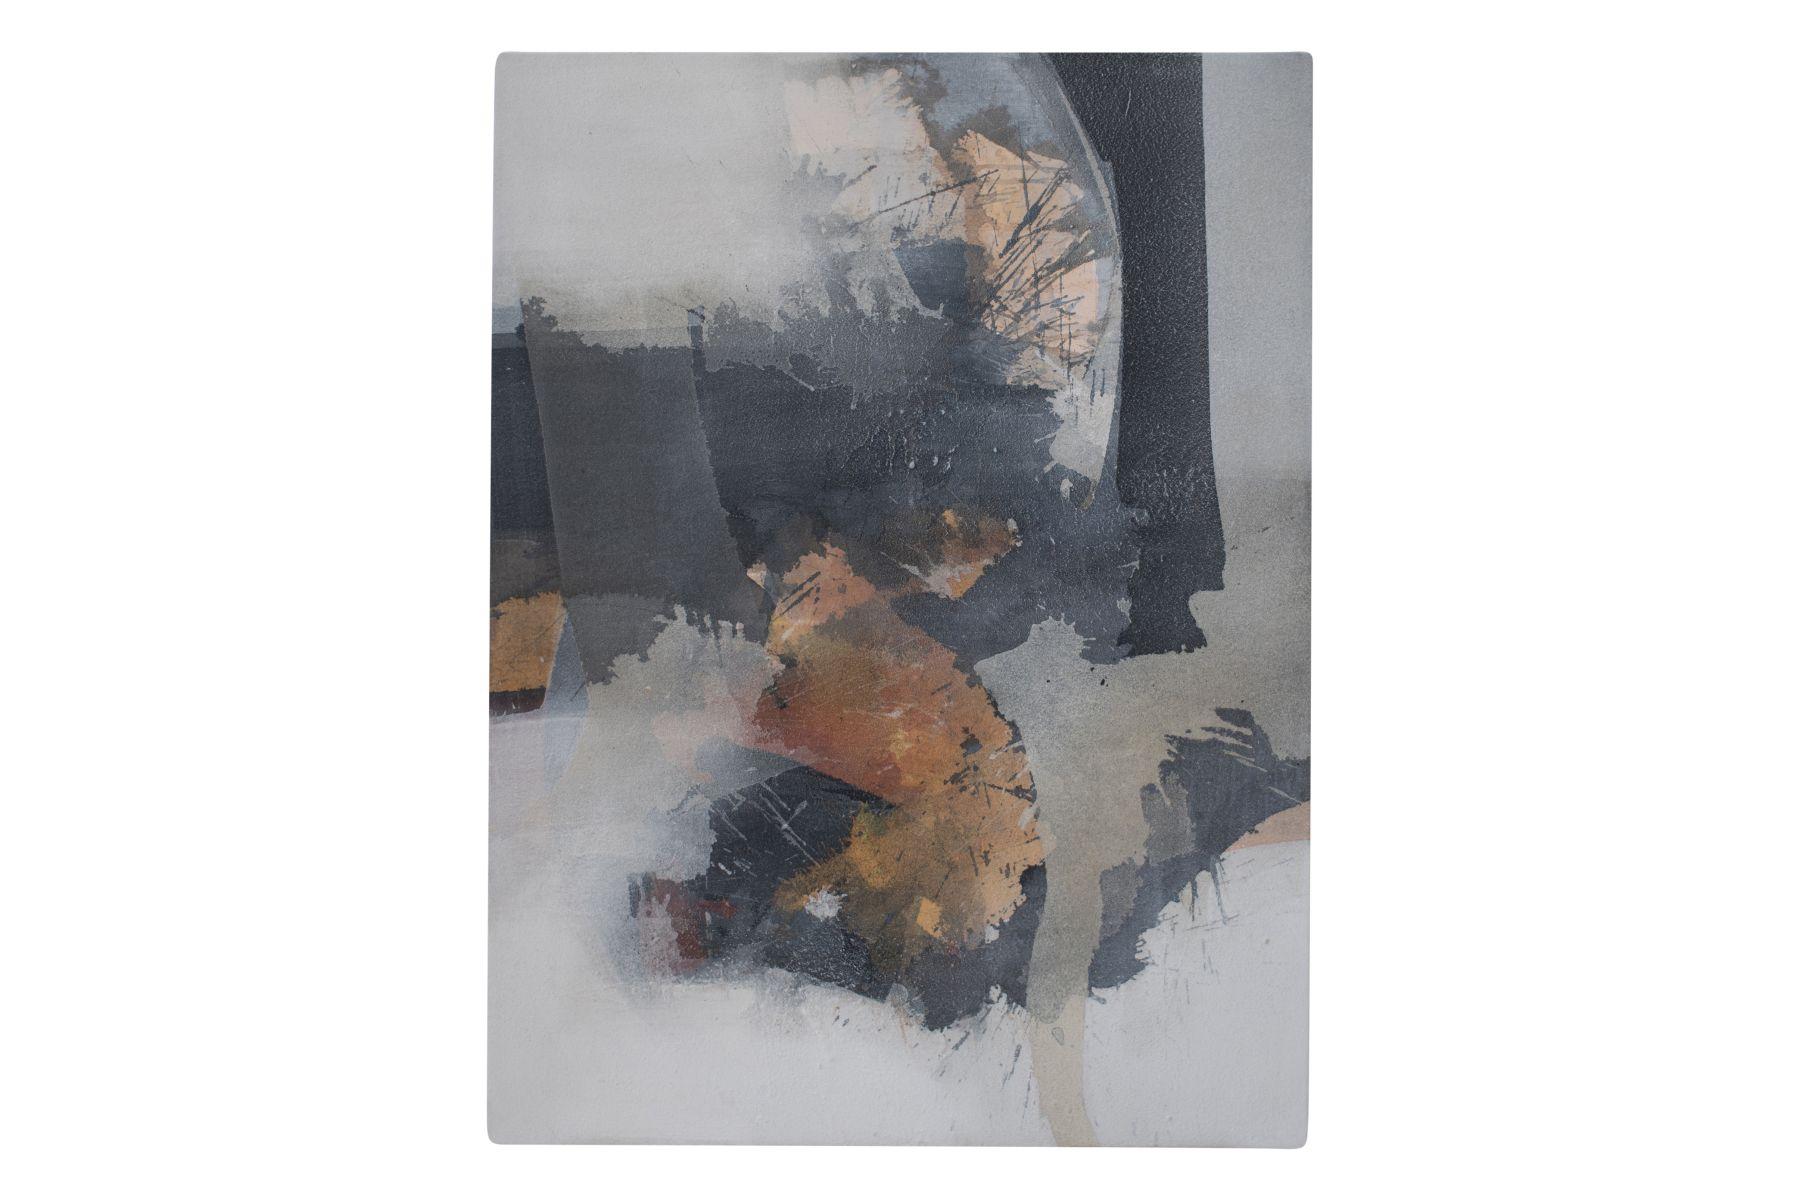 "#56 Roger Gressl (1959) ""Abstract Compositions""   Roger Gressl (1959)""Abstrakte Kompositionen"" Image"